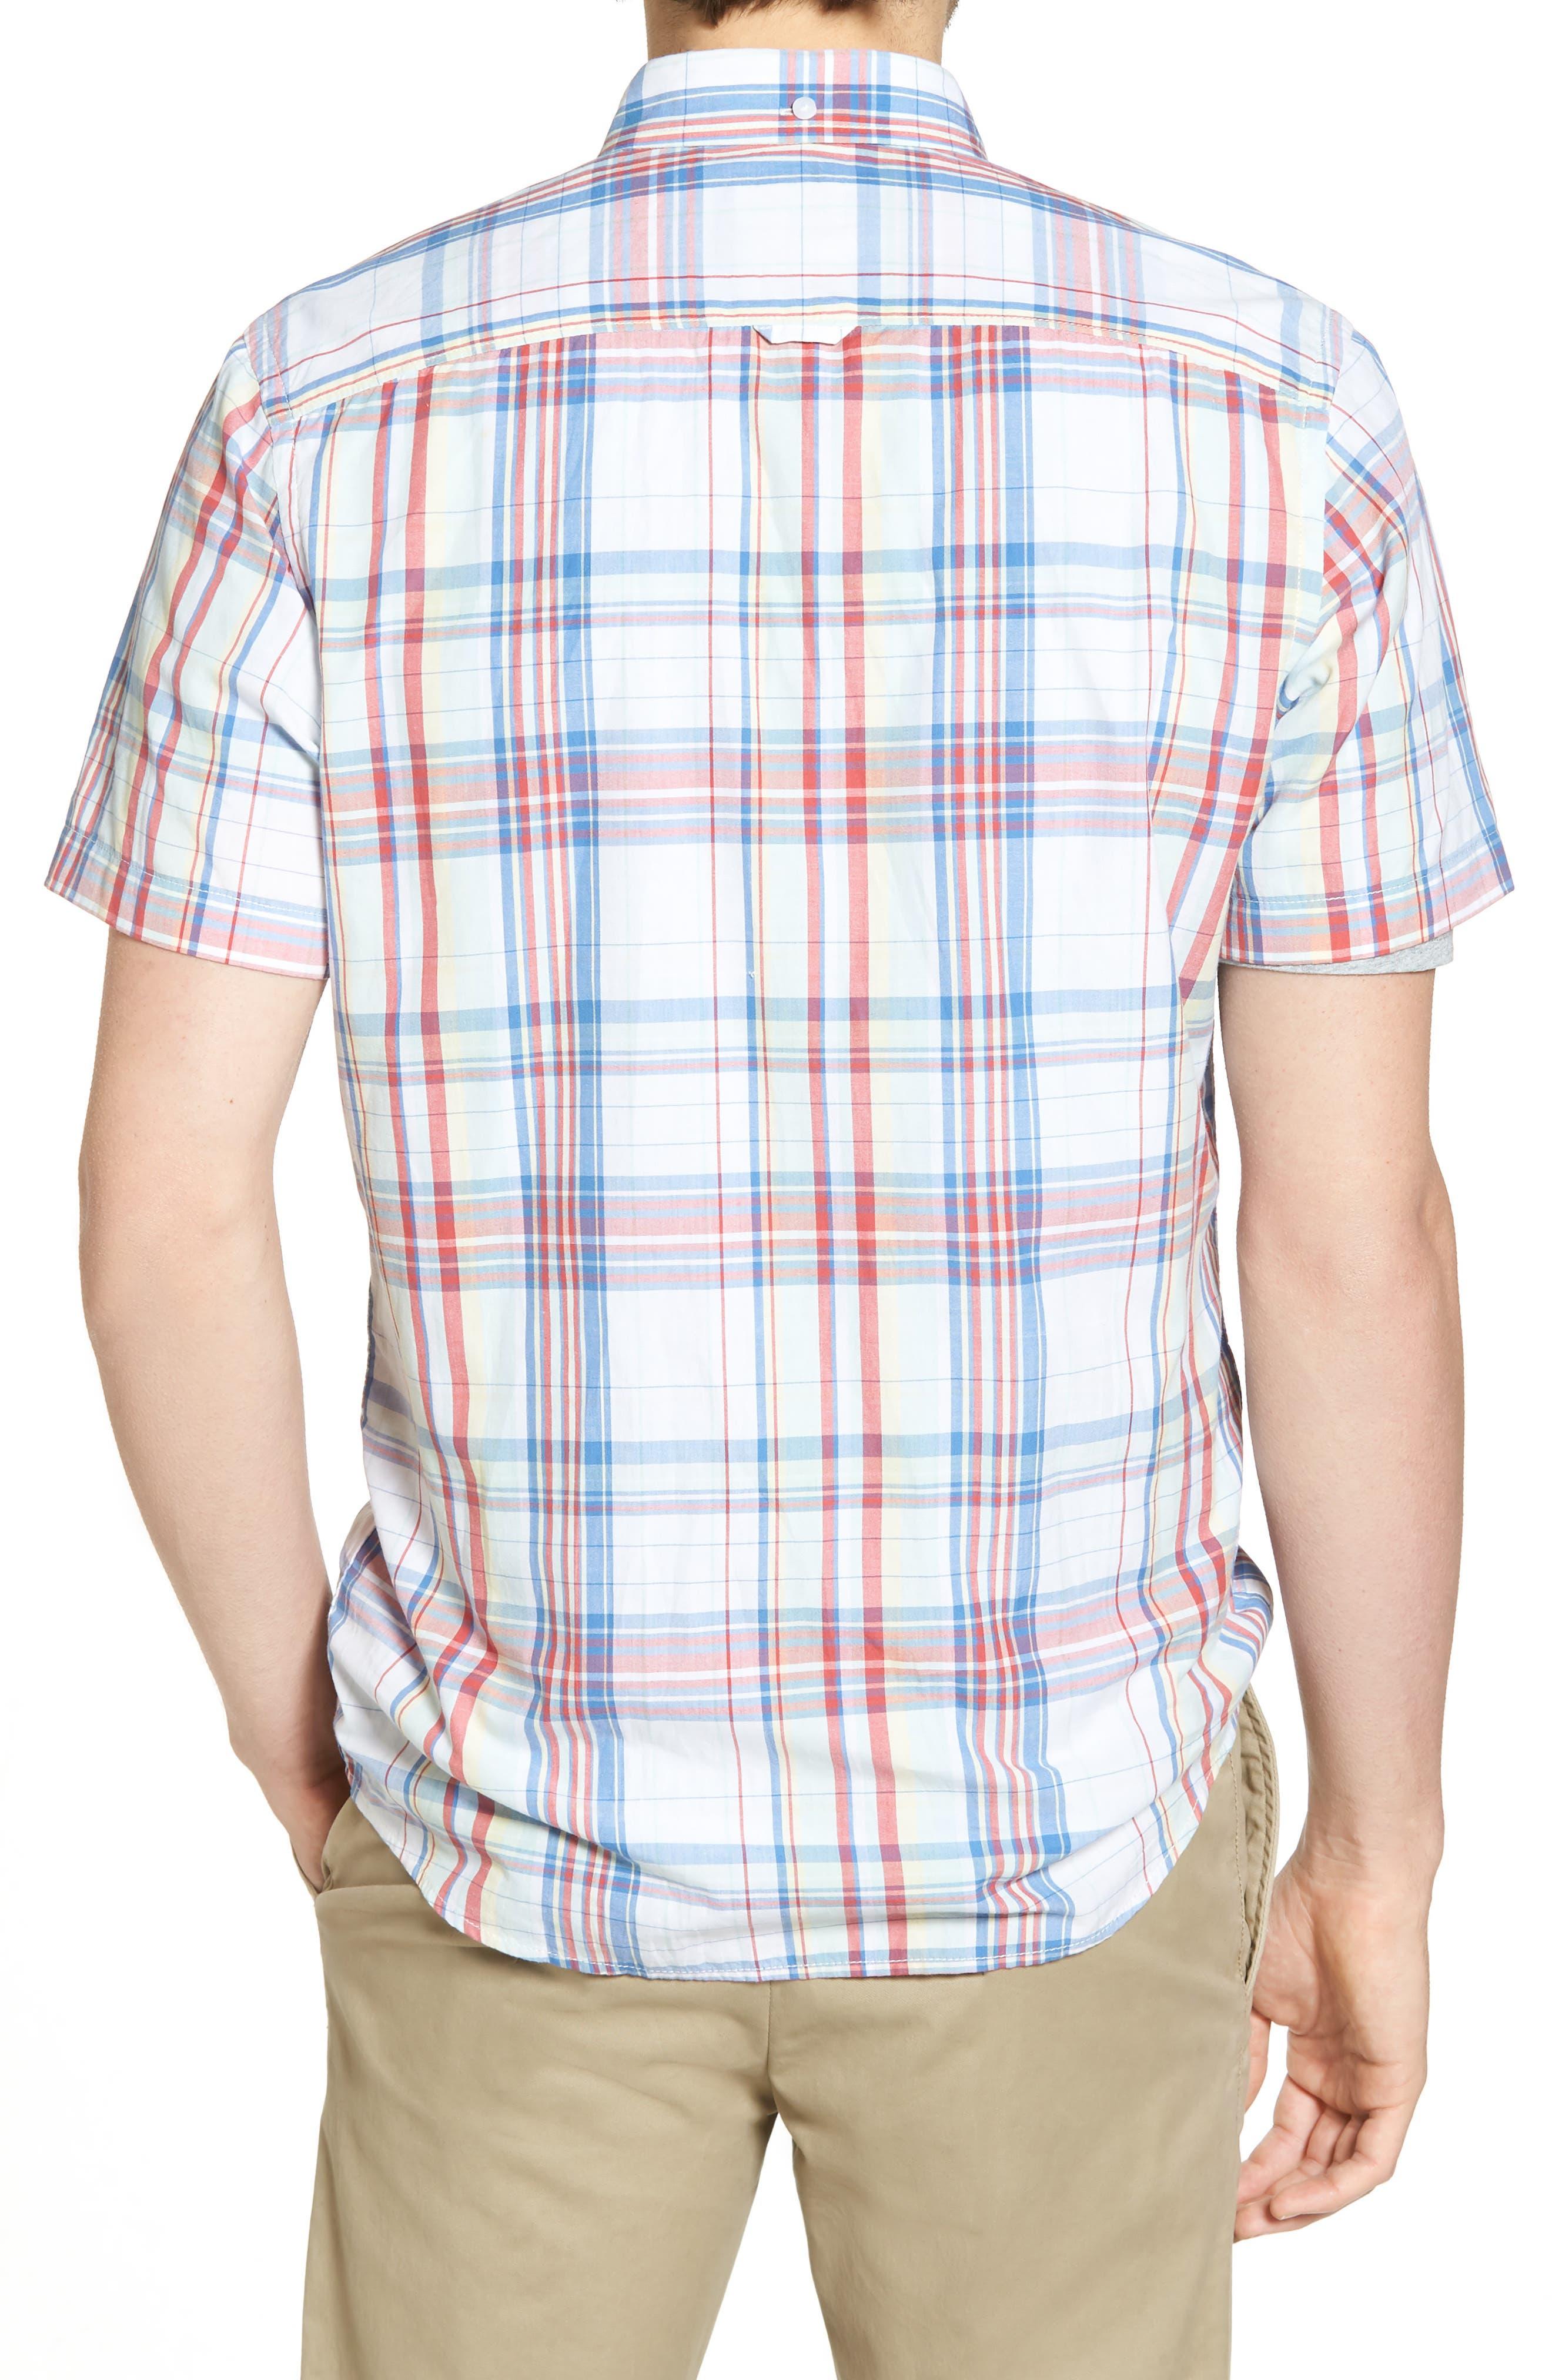 Trim Fit Plaid Short Sleeve Sport Shirt,                             Alternate thumbnail 3, color,                             White Red Multi Plaid